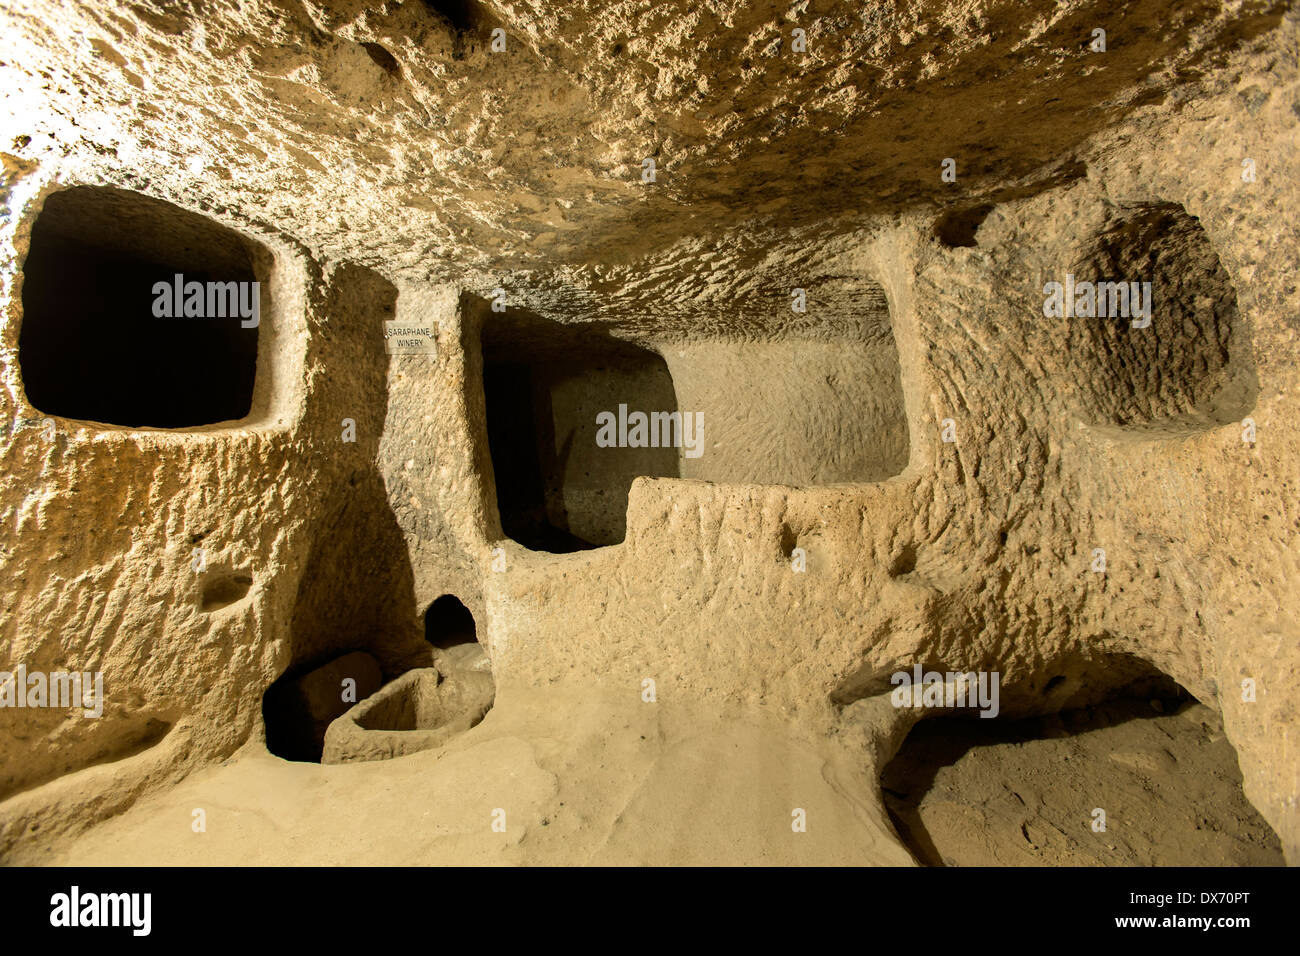 Saraphane Winery, la ville souterraine de Kaymakli, Cappadoce, Turquie Photo Stock